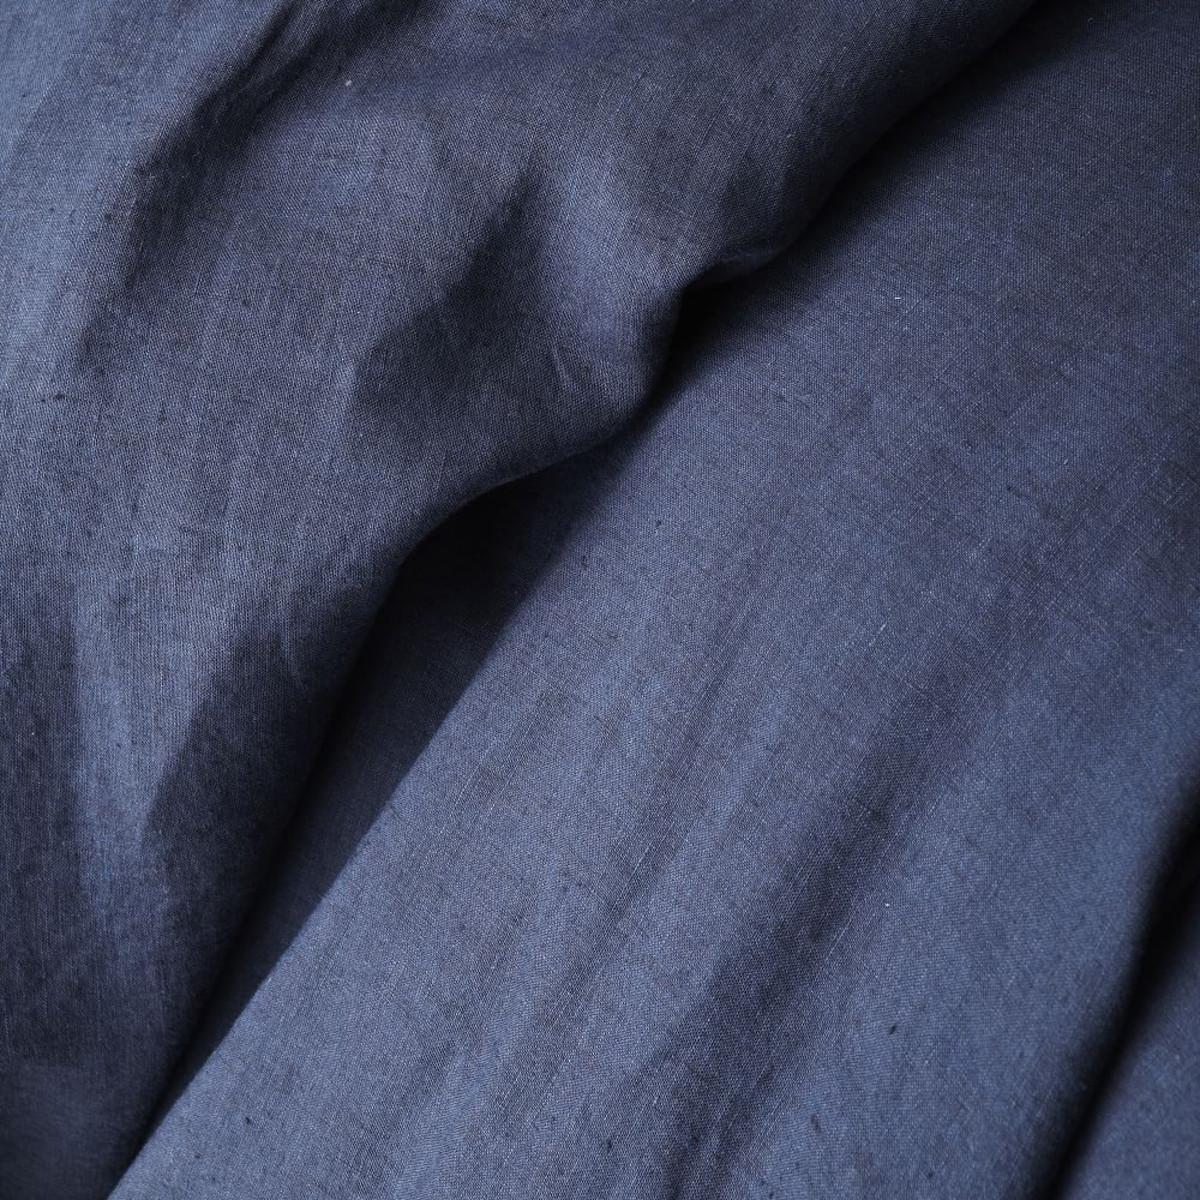 Black flax linen may comfort